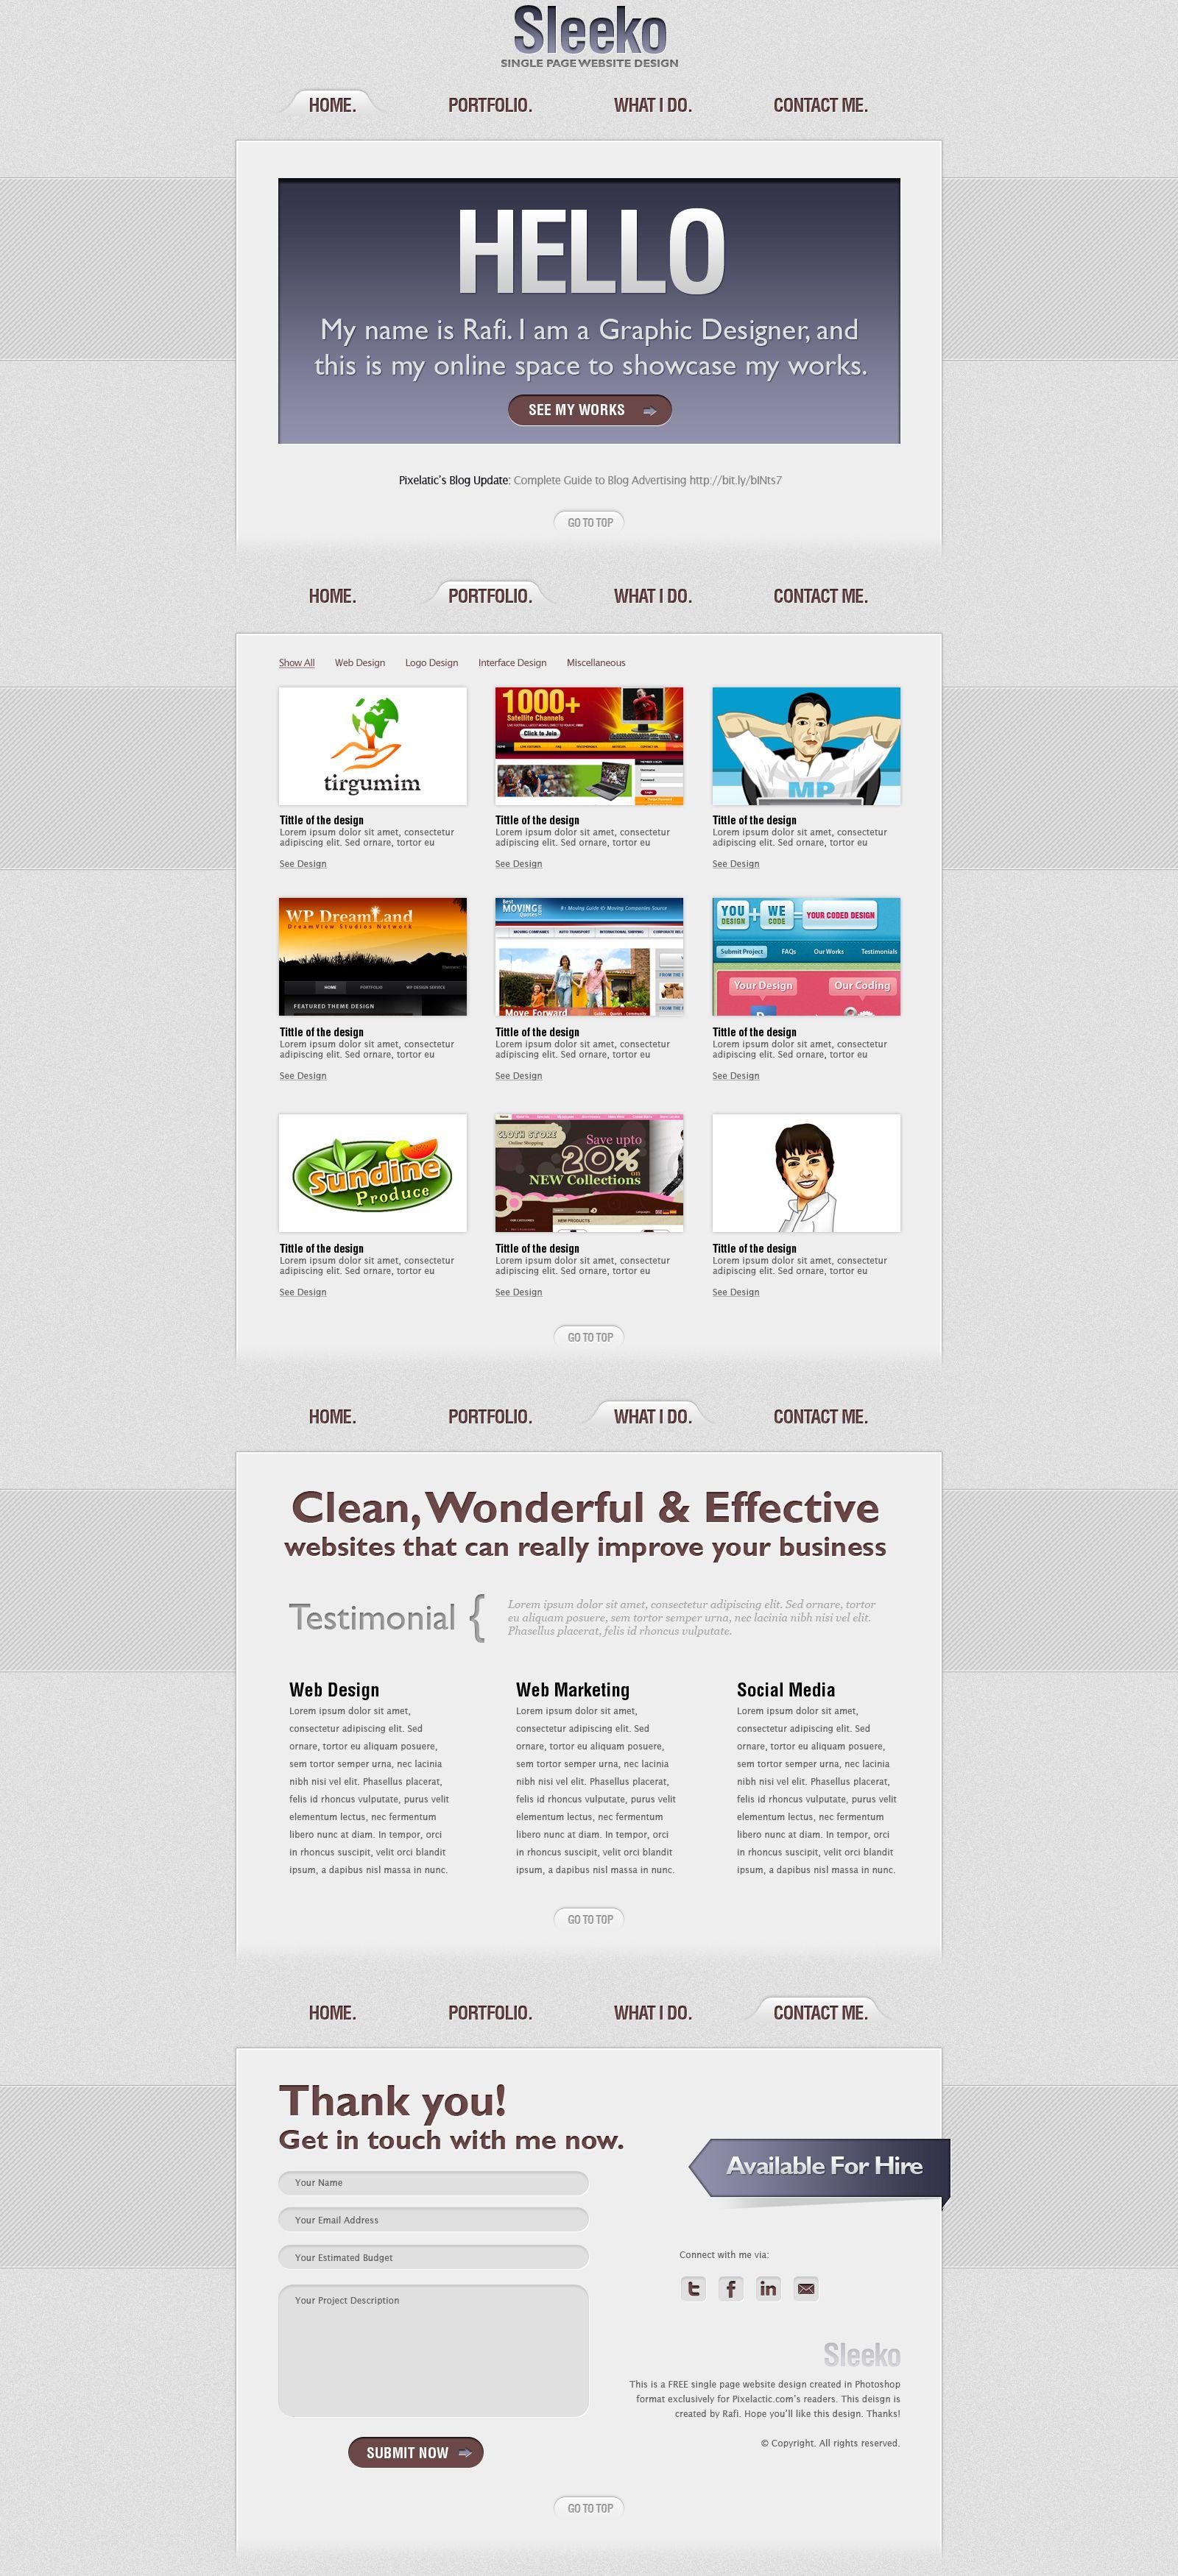 Sleeko Single Page Website Design | Freebies | Pinterest | Website ...